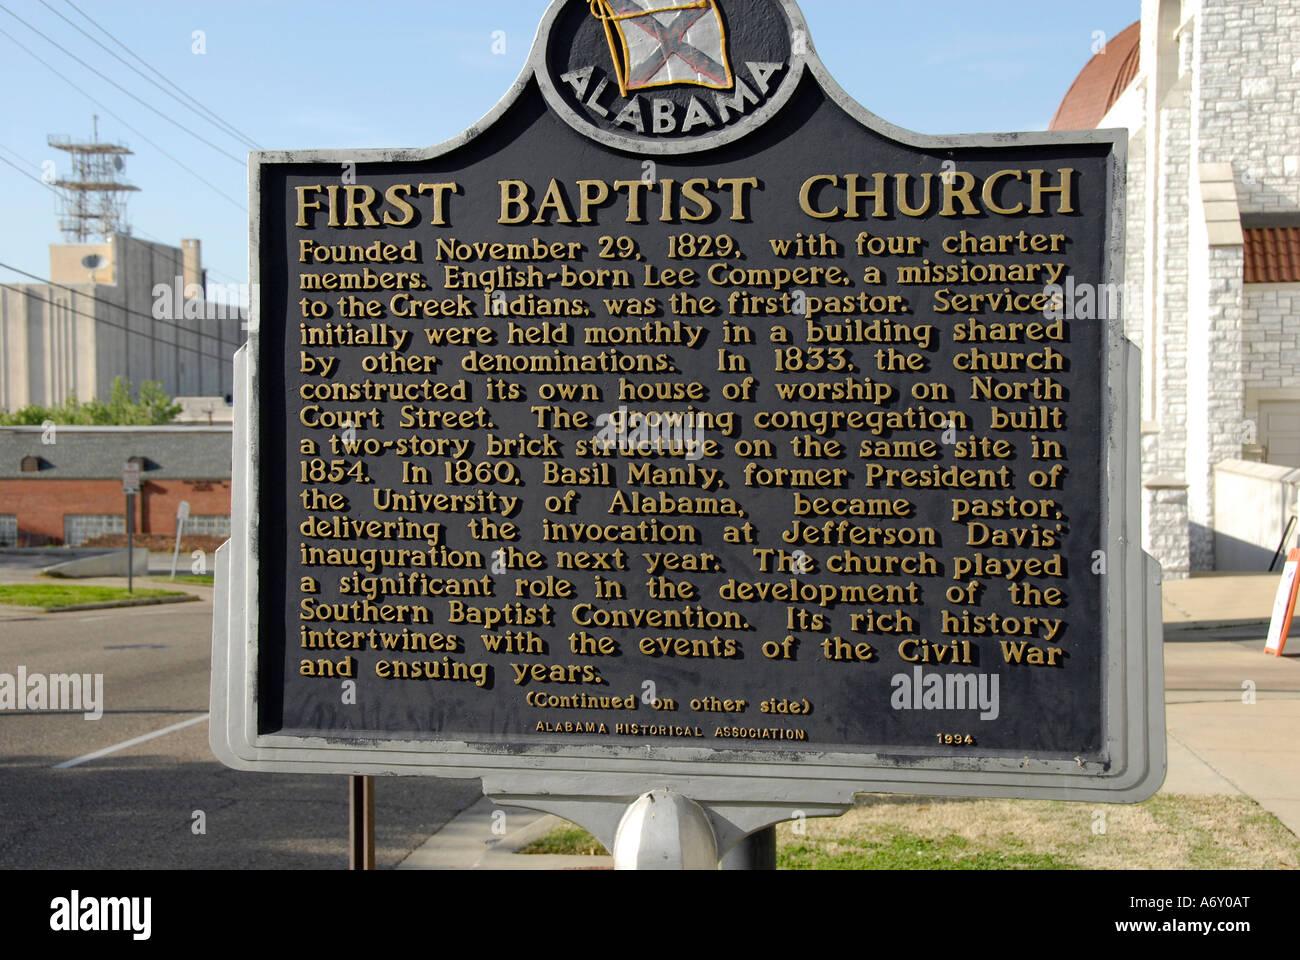 first baptist church alabama stock photos u0026 first baptist church